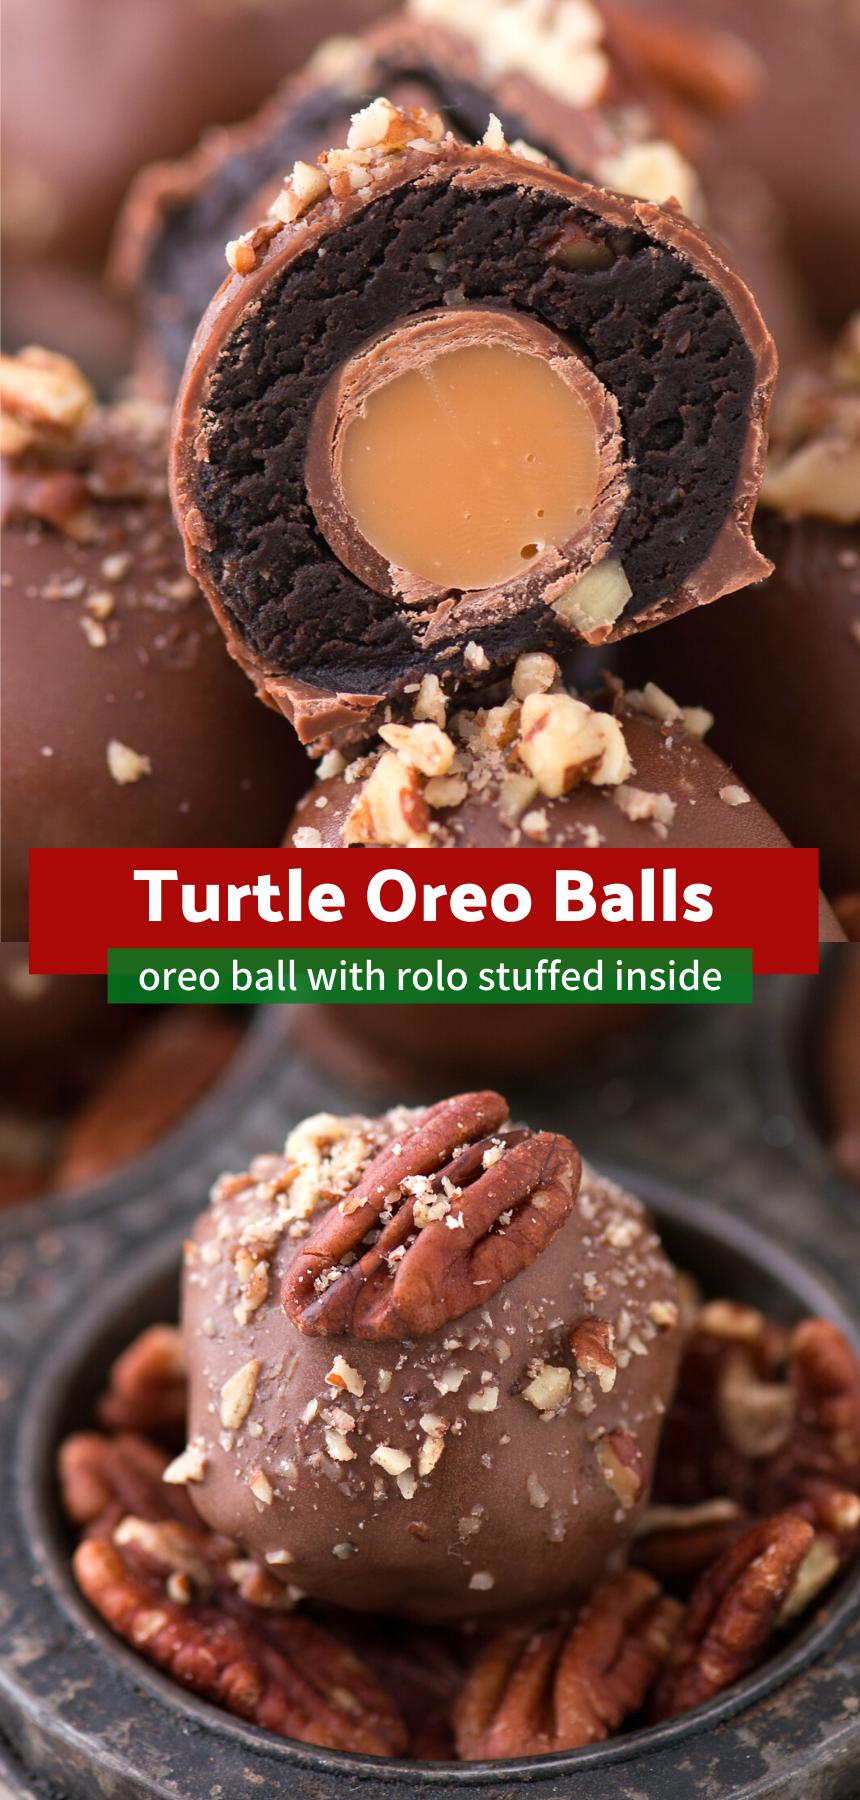 Turtle Oreo Balls